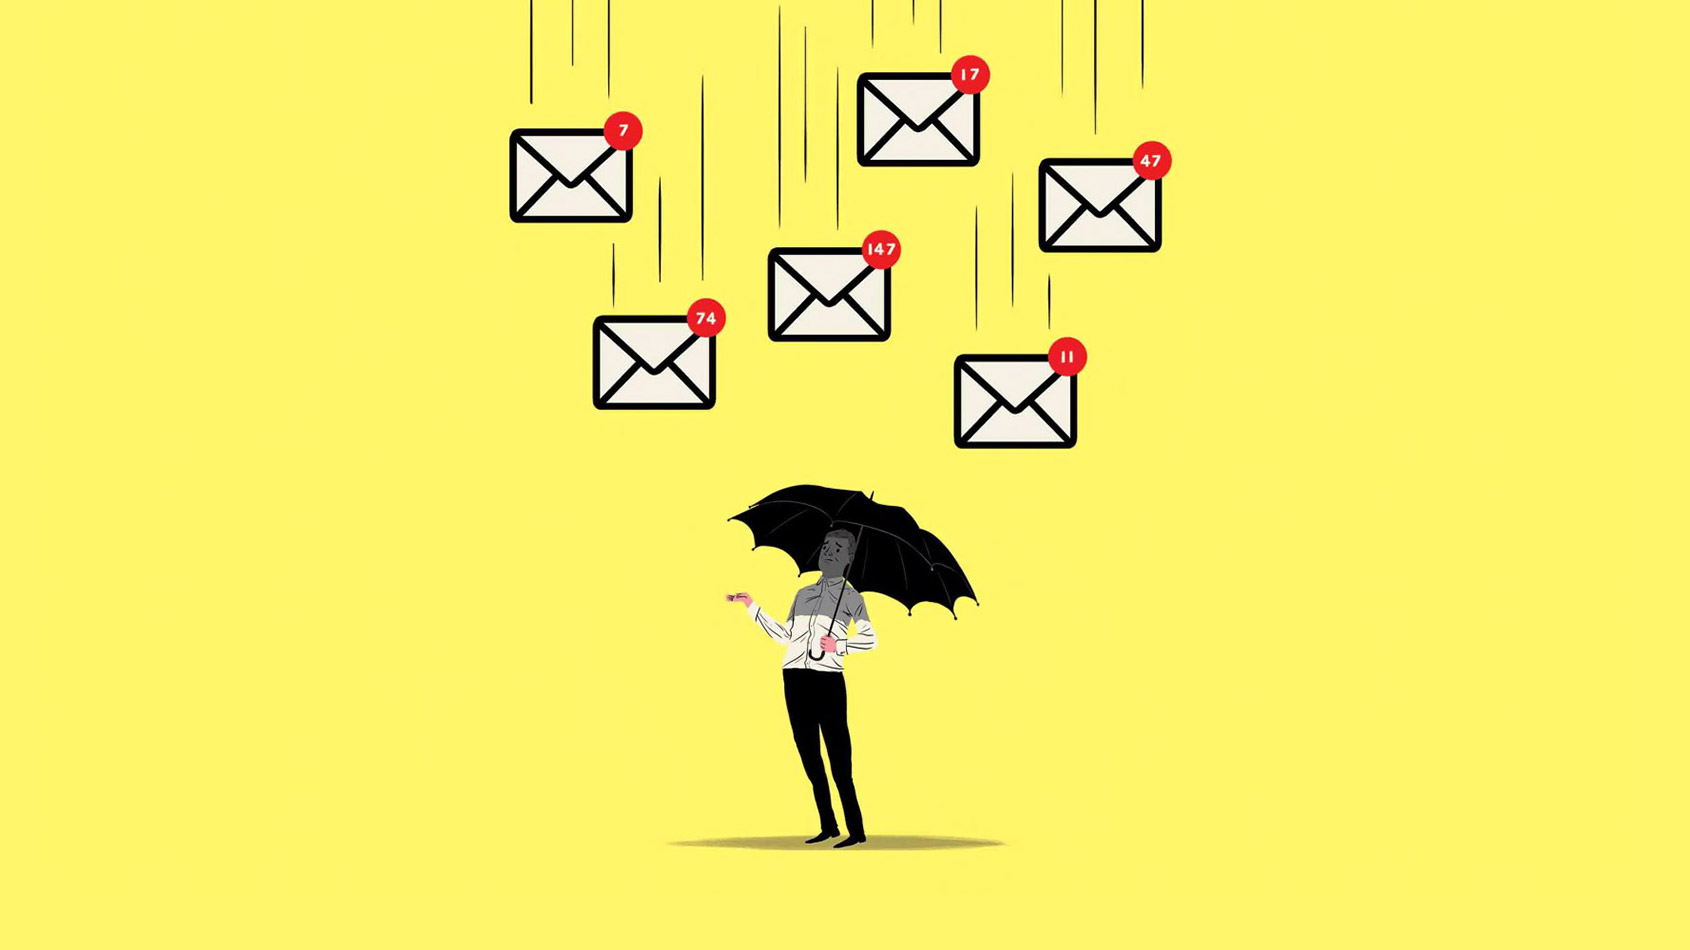 illustration of debt mail falling on gentelman with umbrella